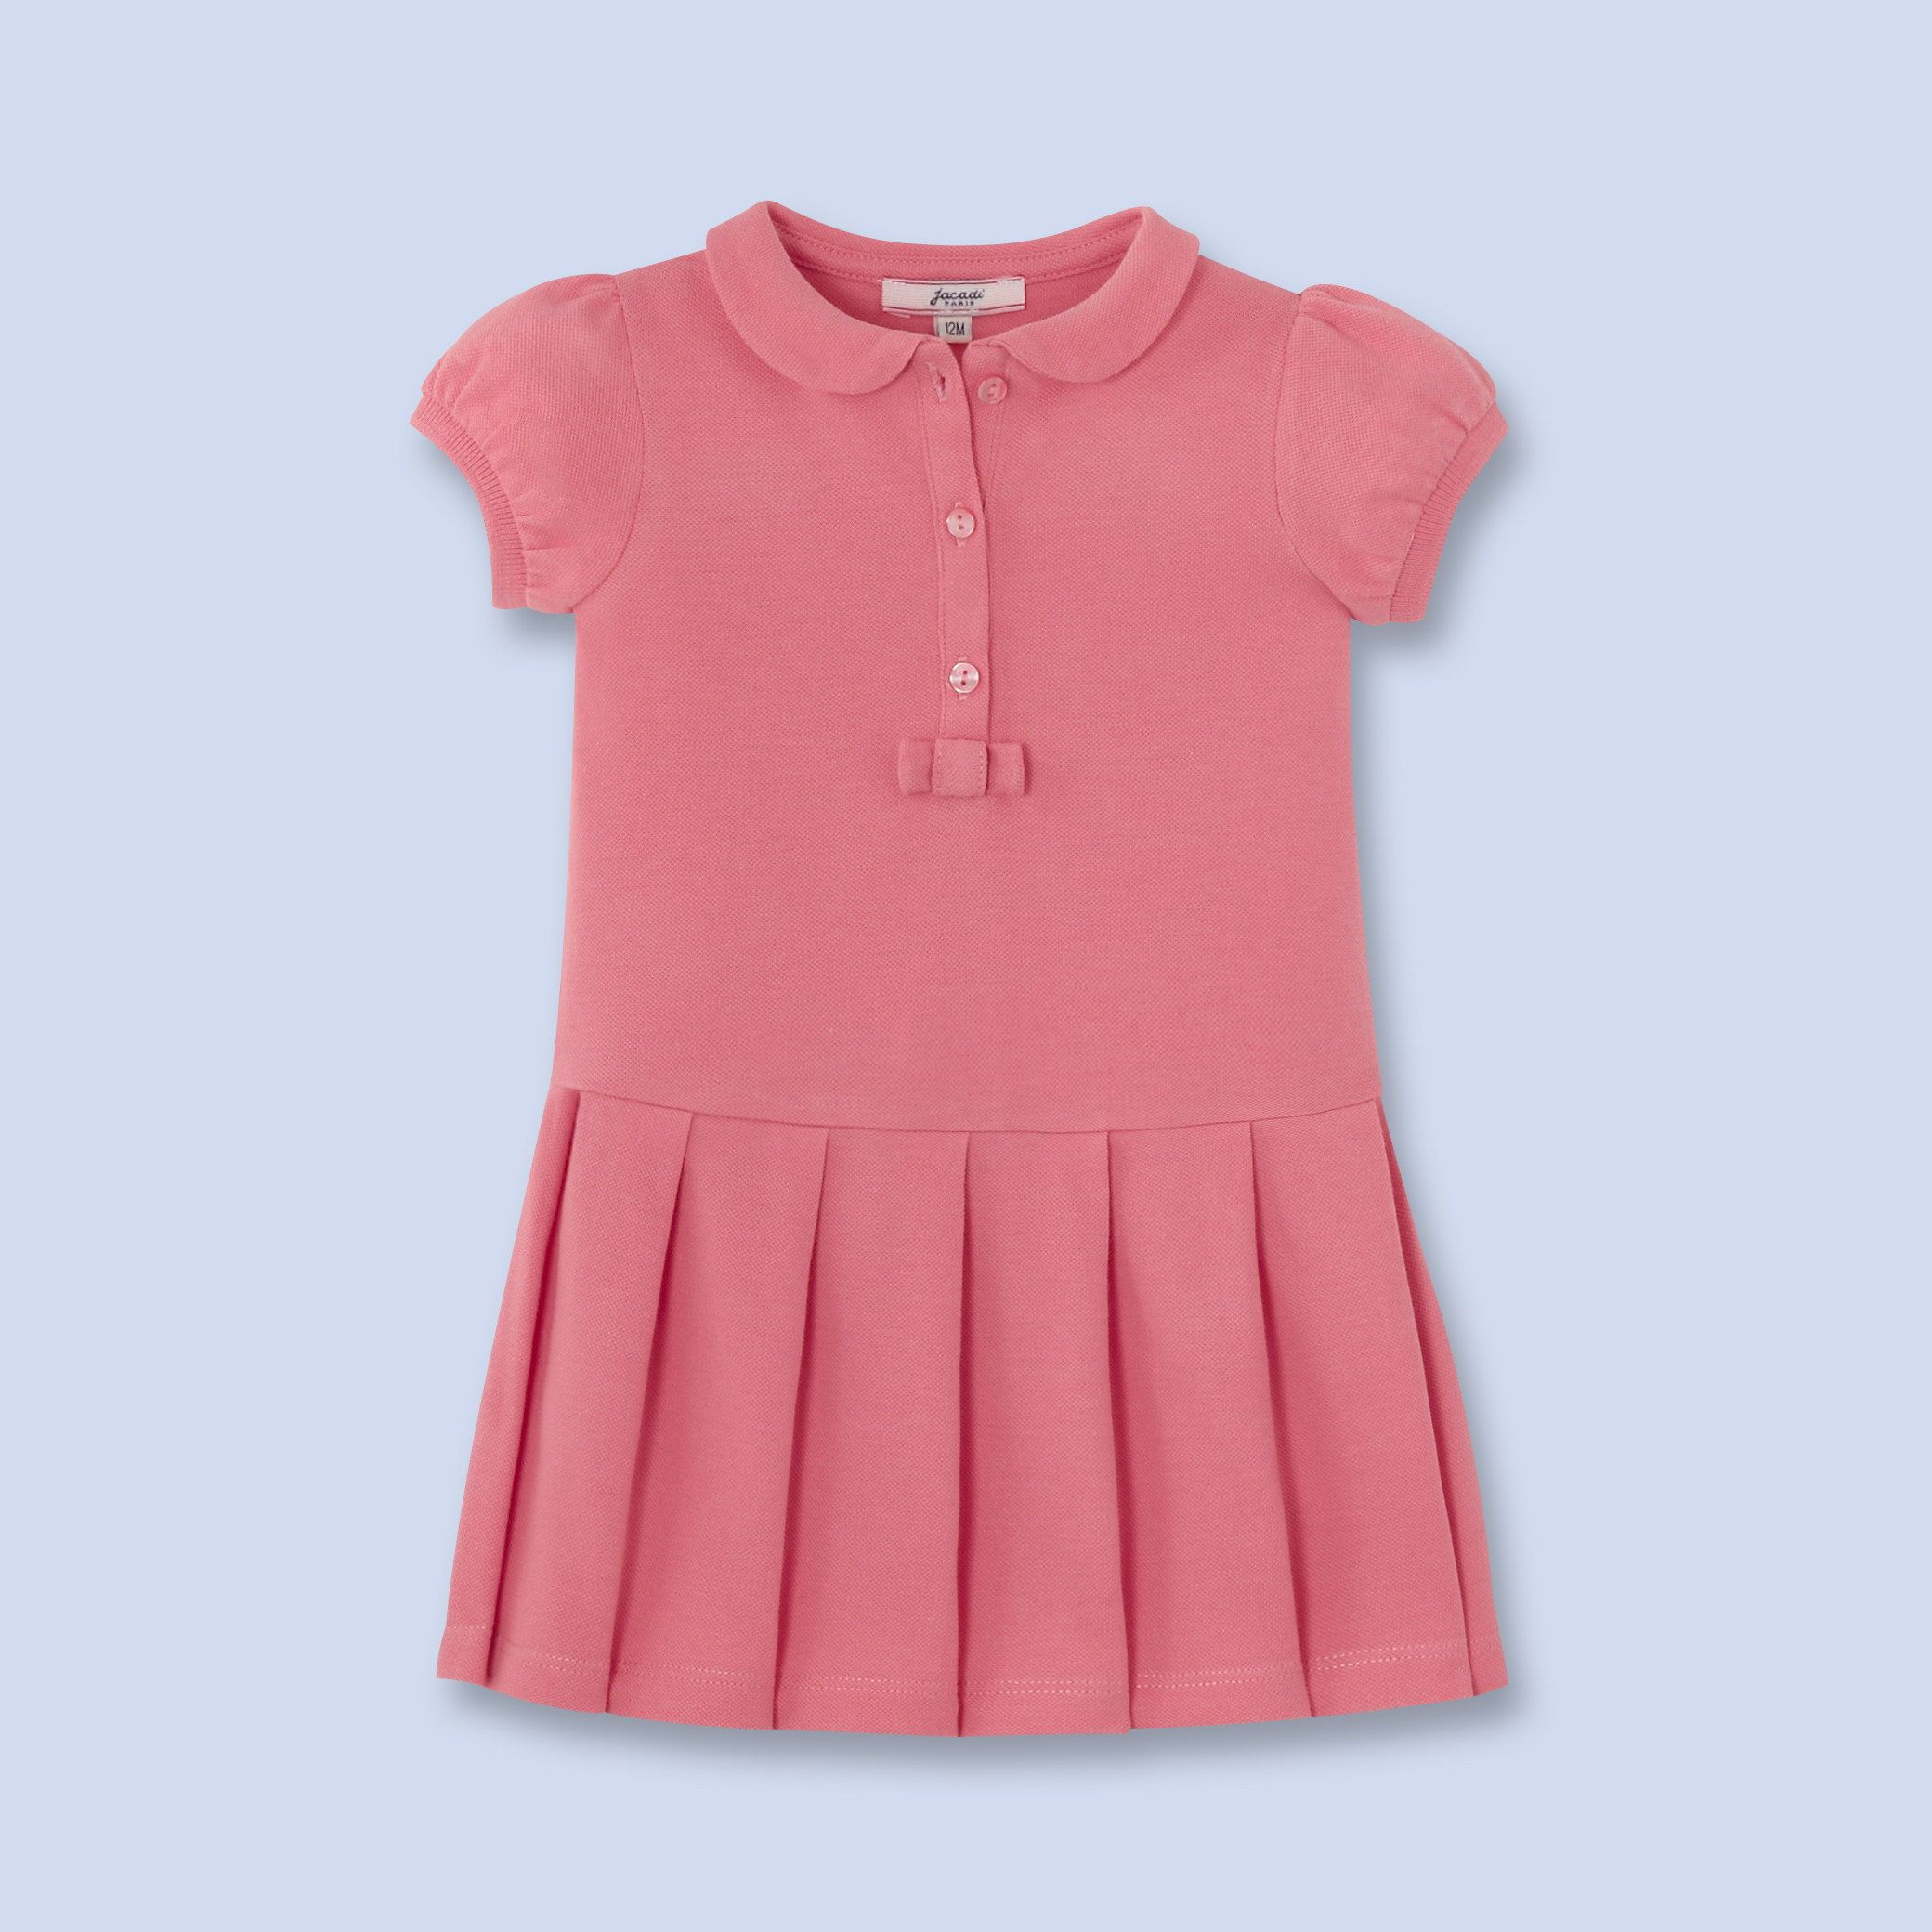 Cotton polo dress for baby girl Kids Pinterest